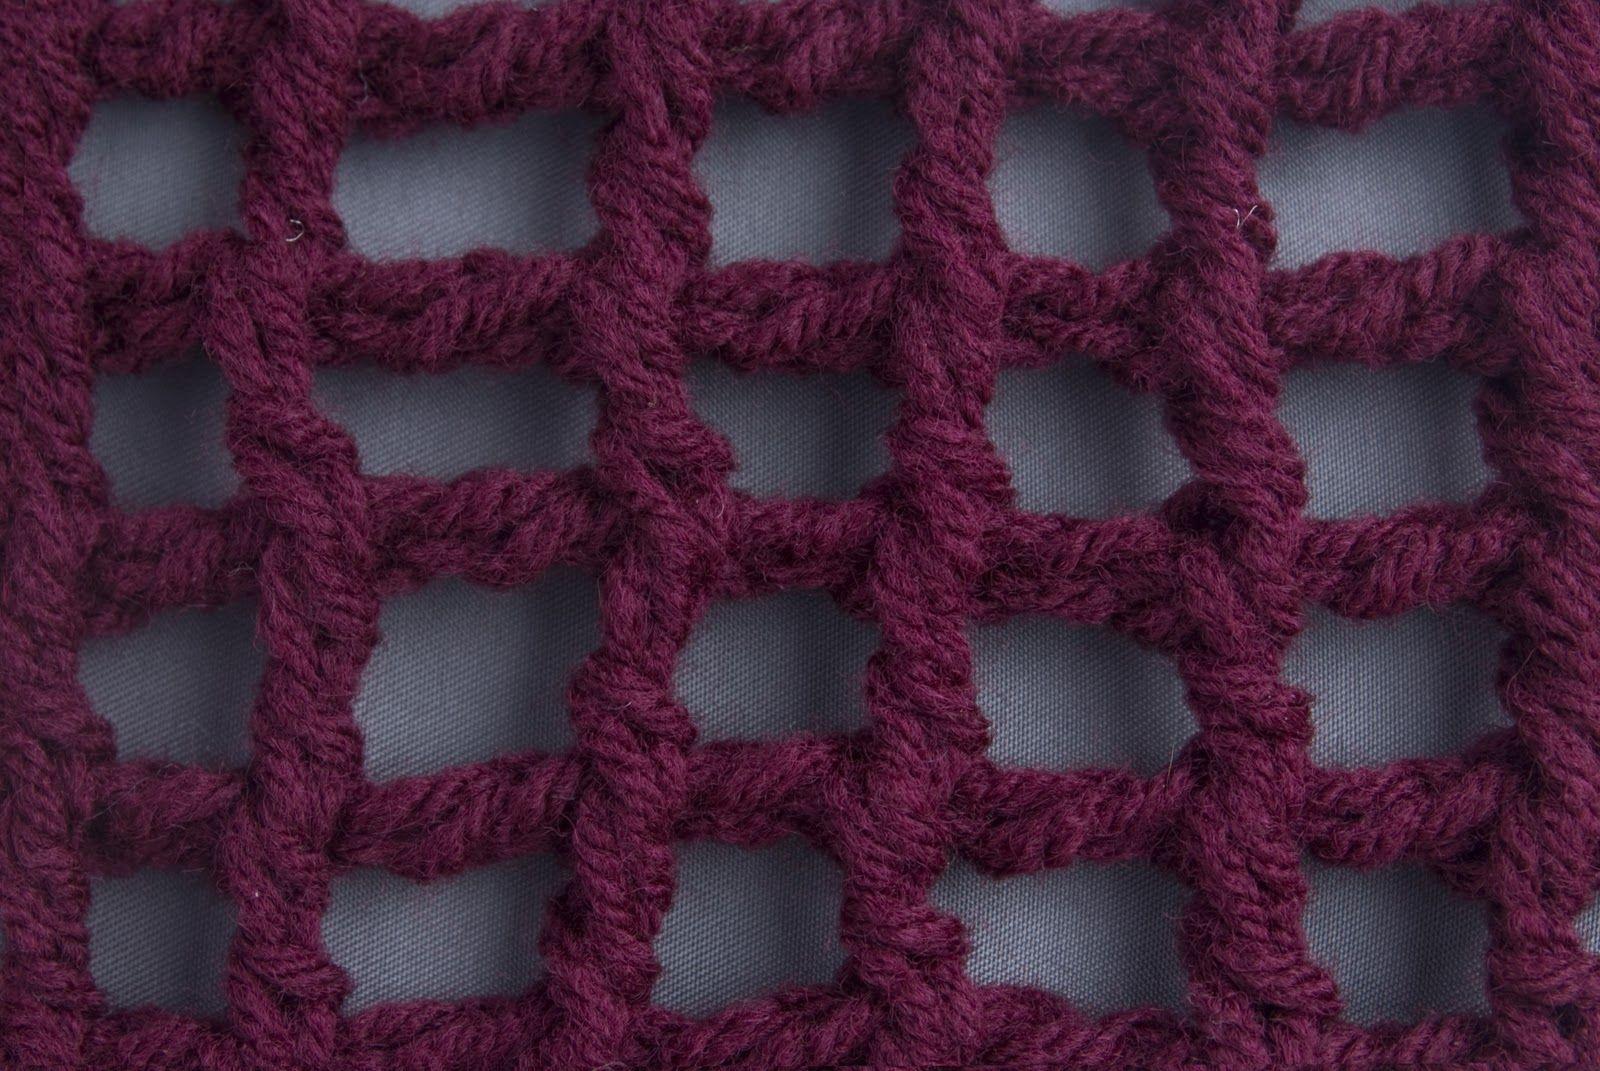 My Tunisian Crochet: Tunisian Crochet Stitch Instructions Index ...